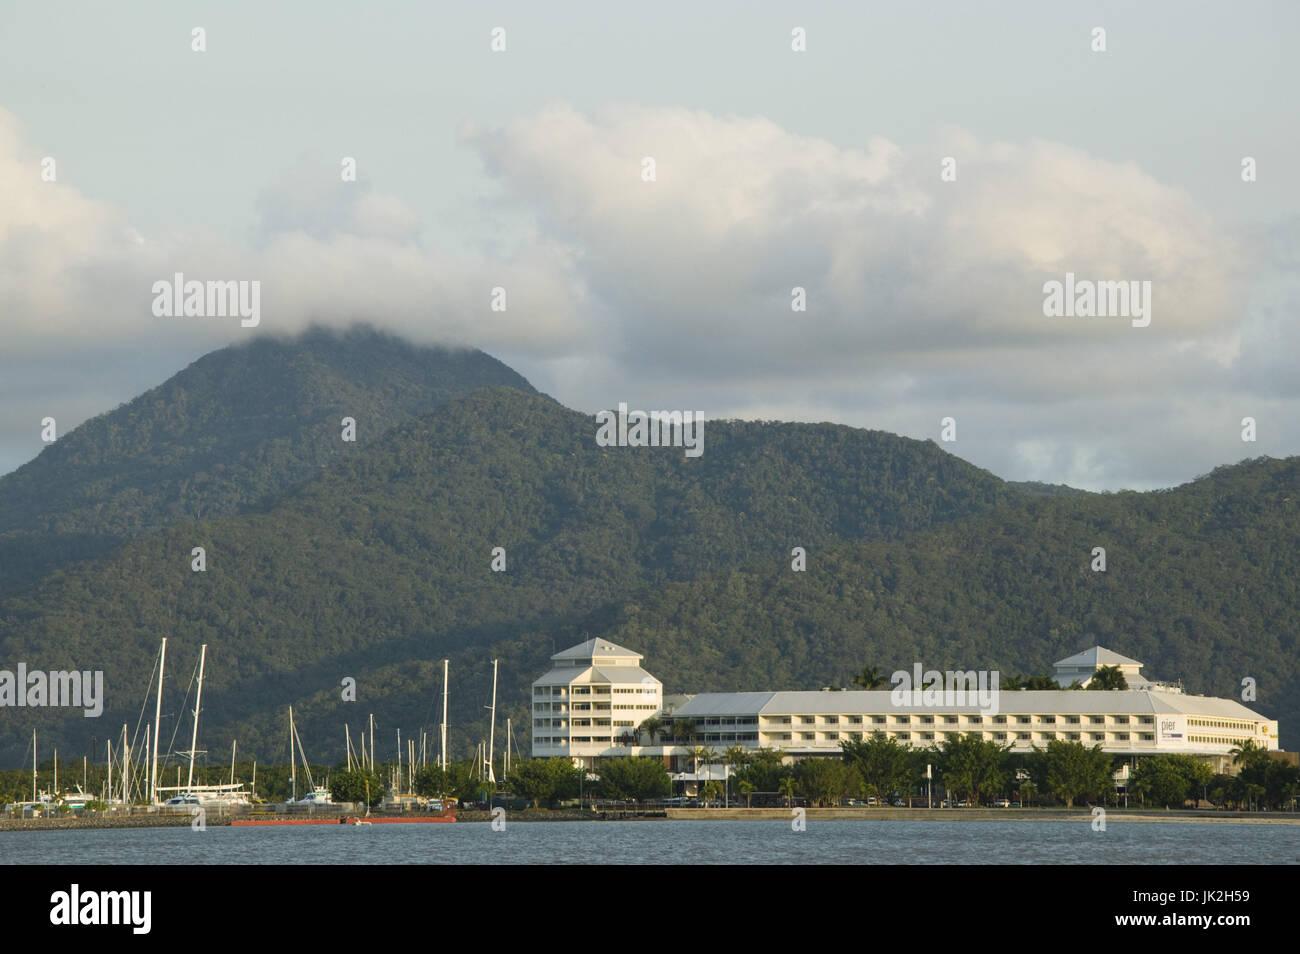 Australia, Queensland, North Coast, Cairns, Cairns Harbour from the Esplanade, Stock Photo